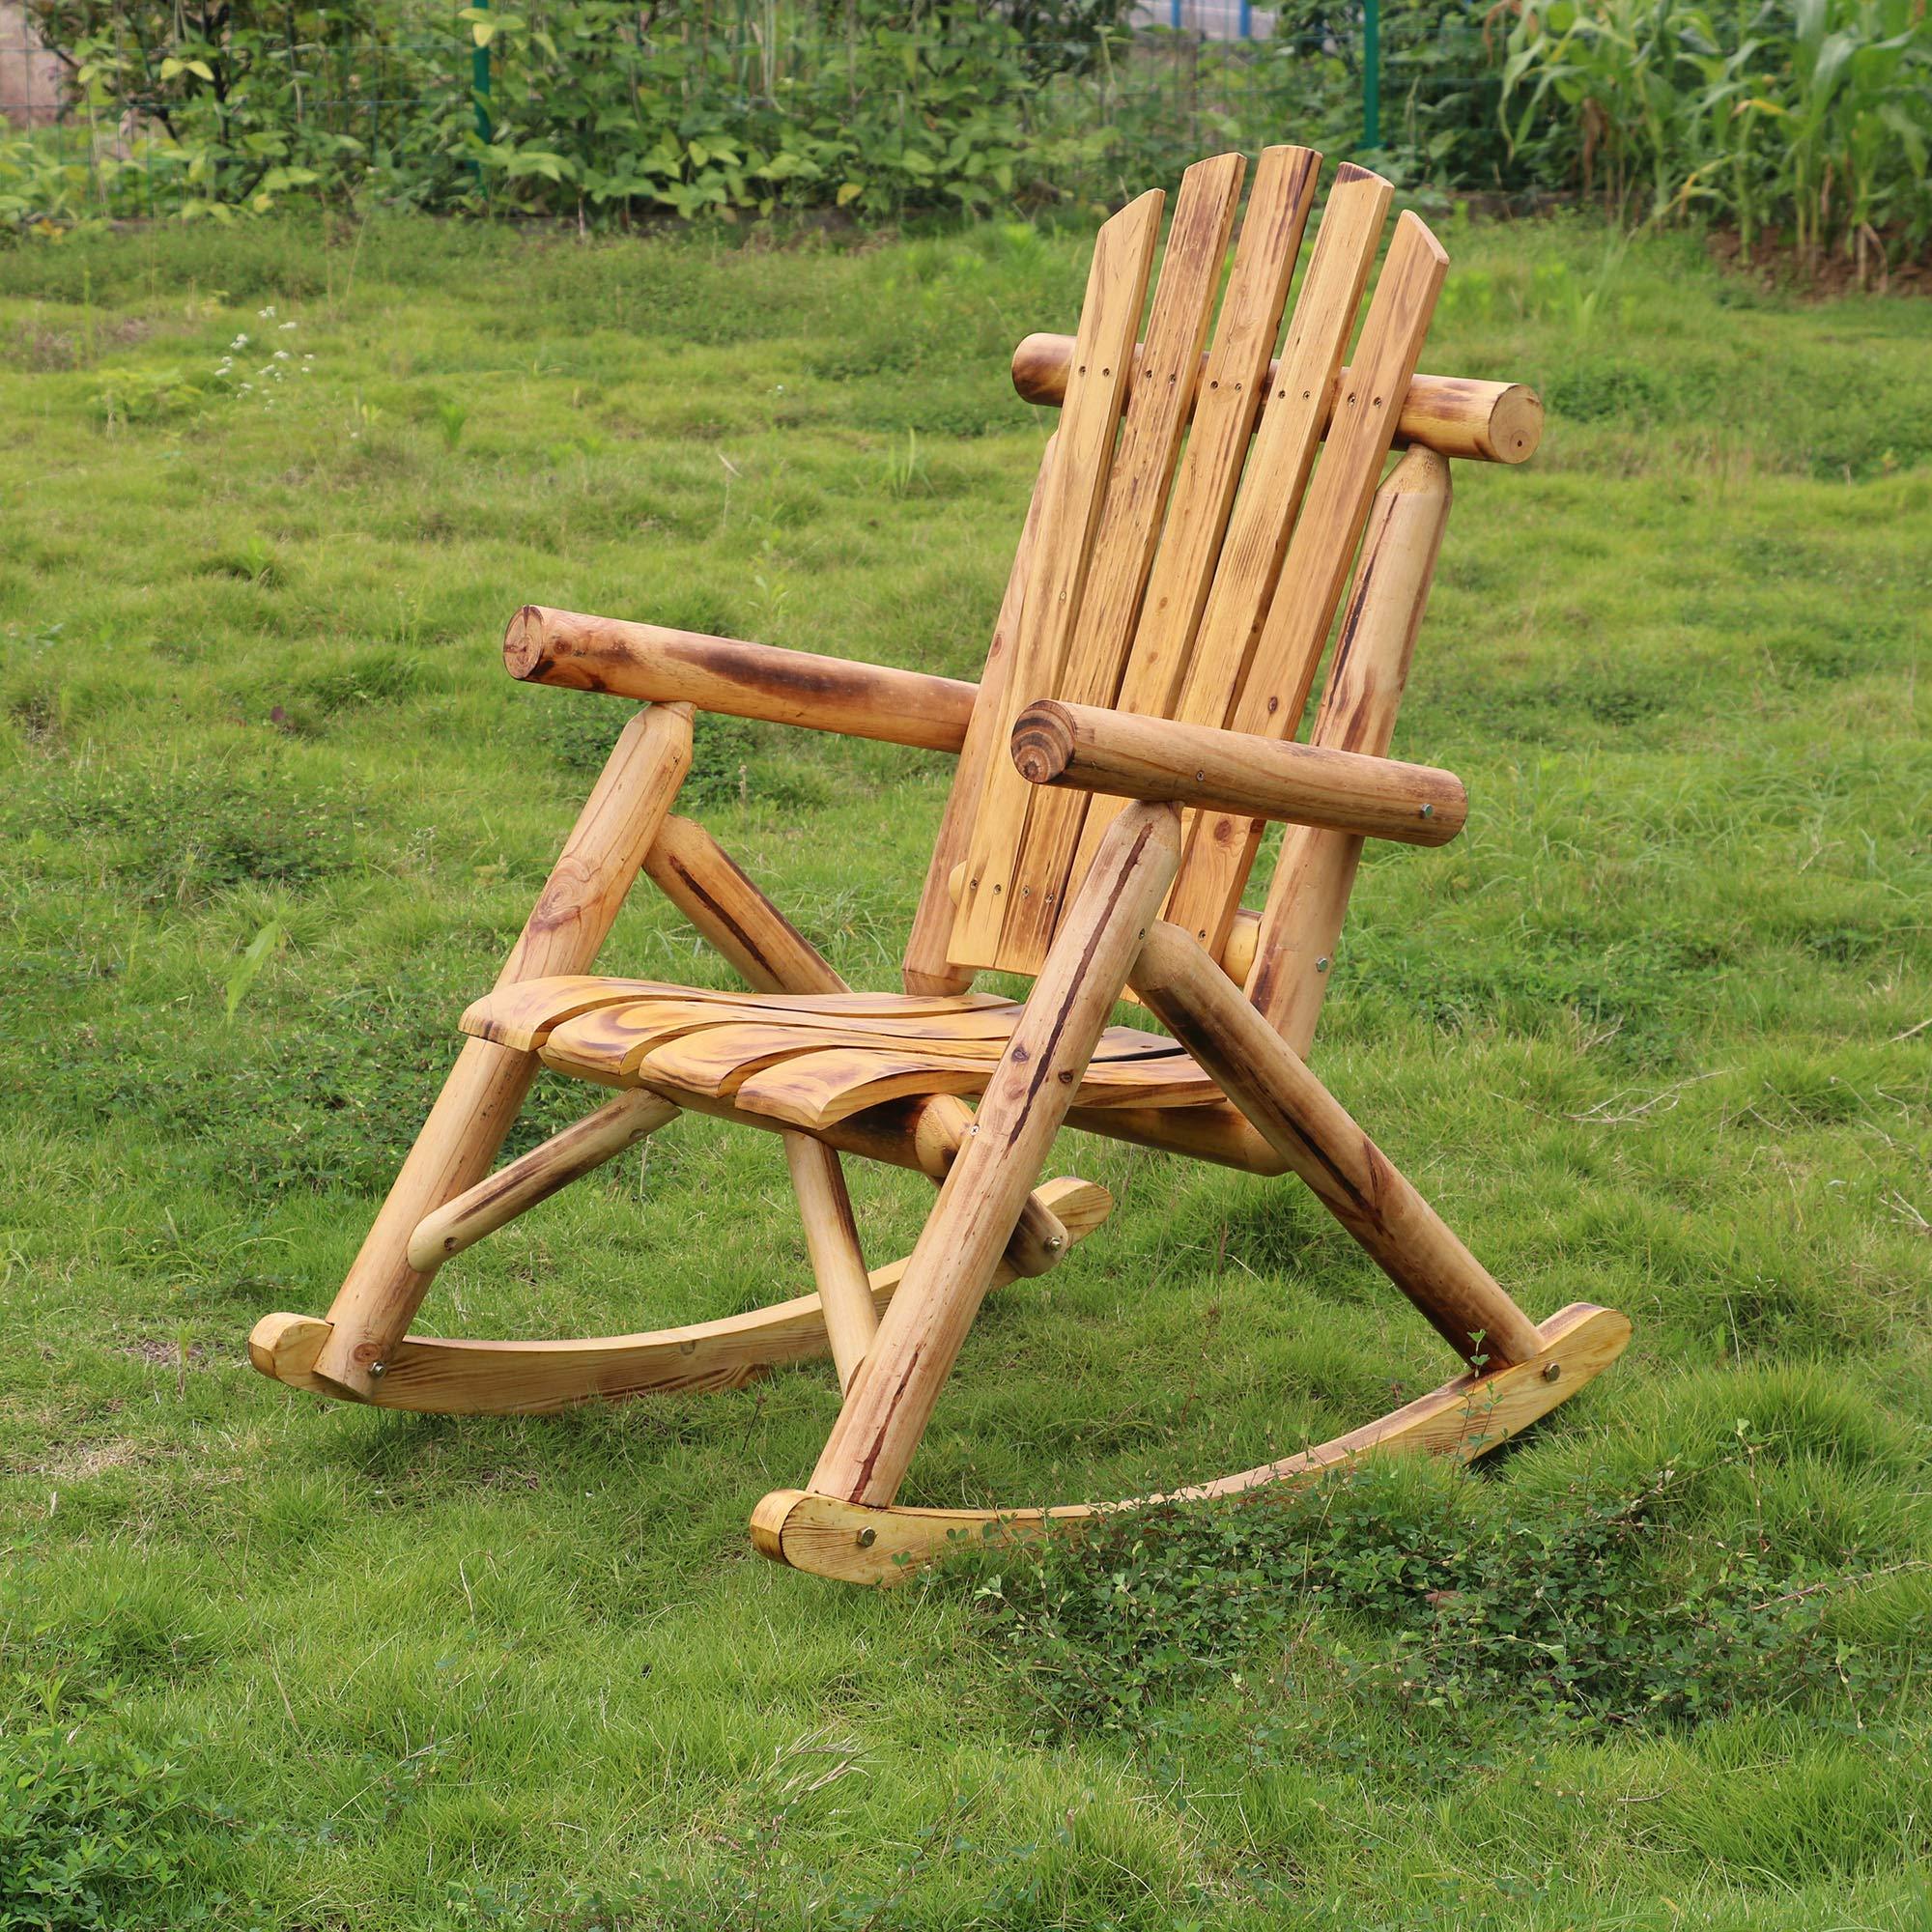 Merax Rocking Chair Solid Wood Indoor Outdoor Rocking Chair for Patio, Yard, Porch, Garden, Backyard, Balcony, Living Room. by Merax